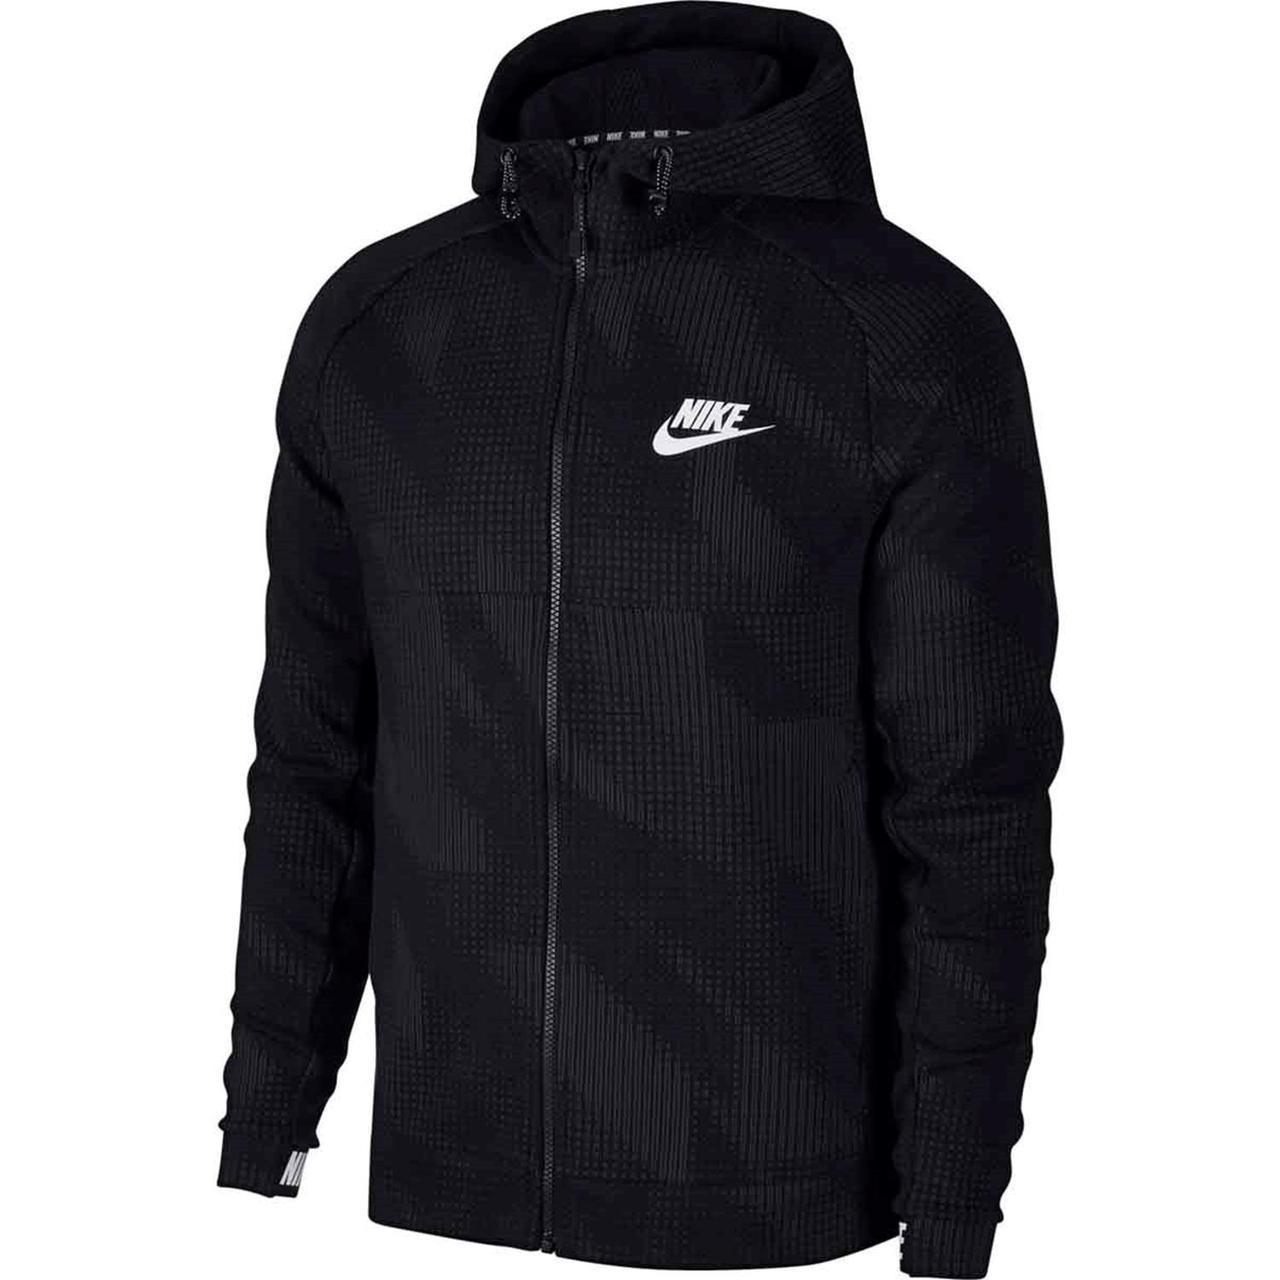 Толстовка Nike Sportswear Advance 15 Hoodie 885937-010 (Оригинал)